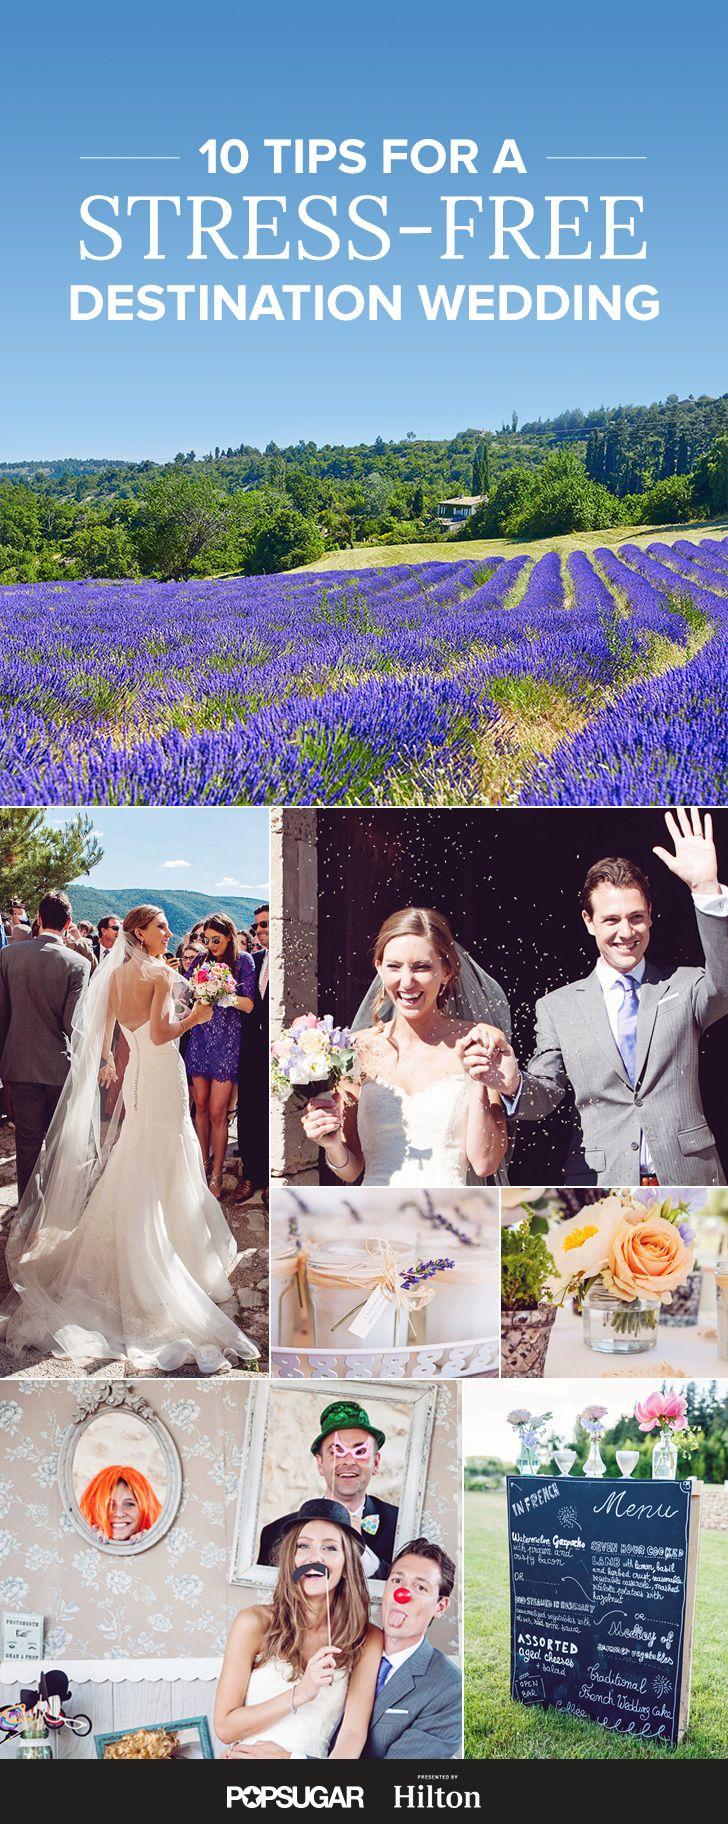 How to plan a destination wedding destination wedding how to plan a destination wedding junglespirit Image collections